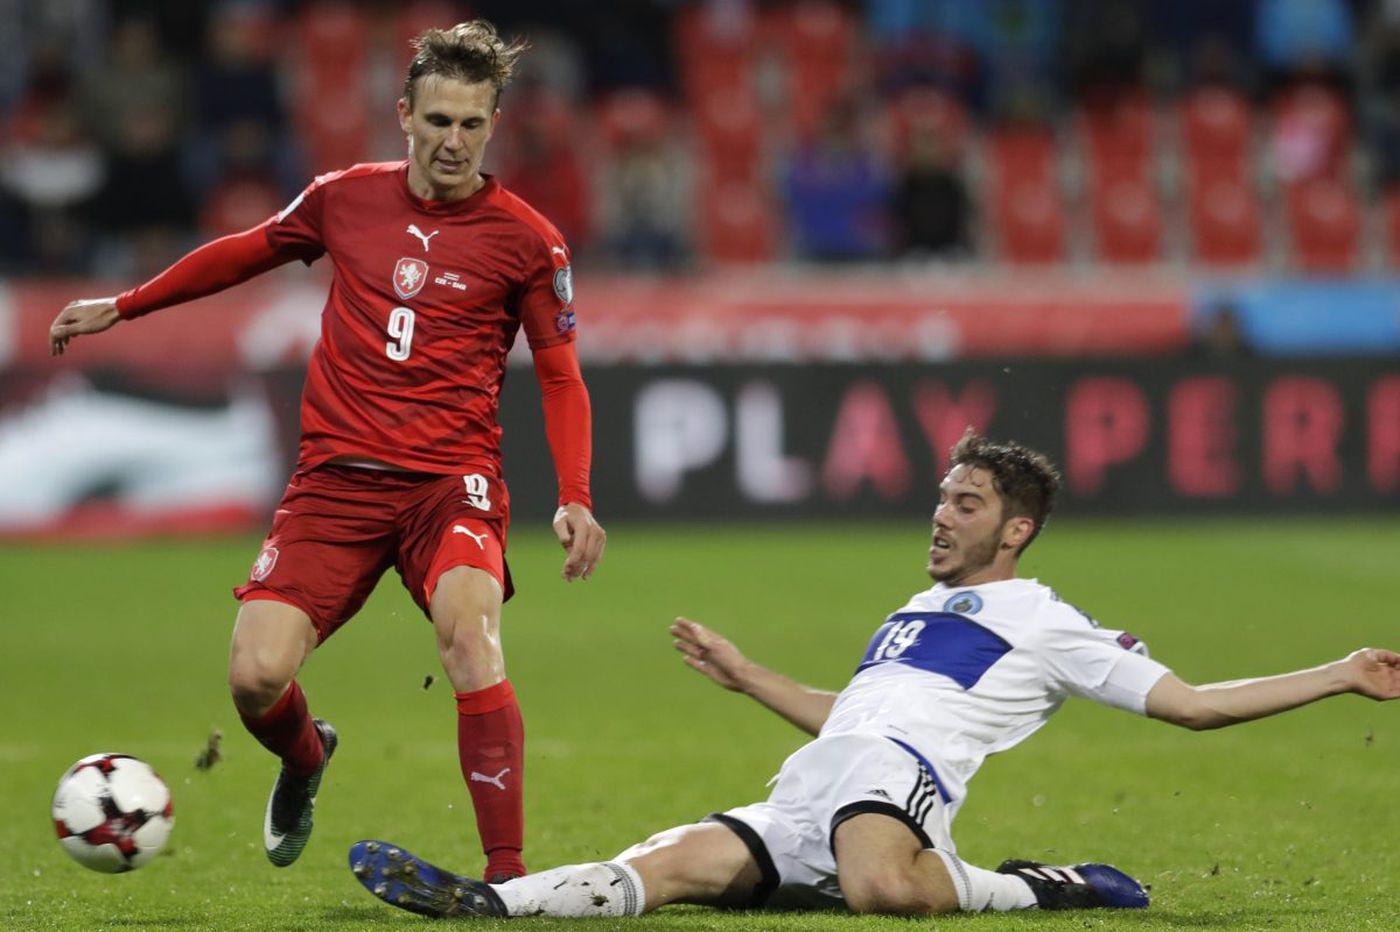 Union pursuing Czech Republic's Borek Dockal, much-needed midfield playmaker